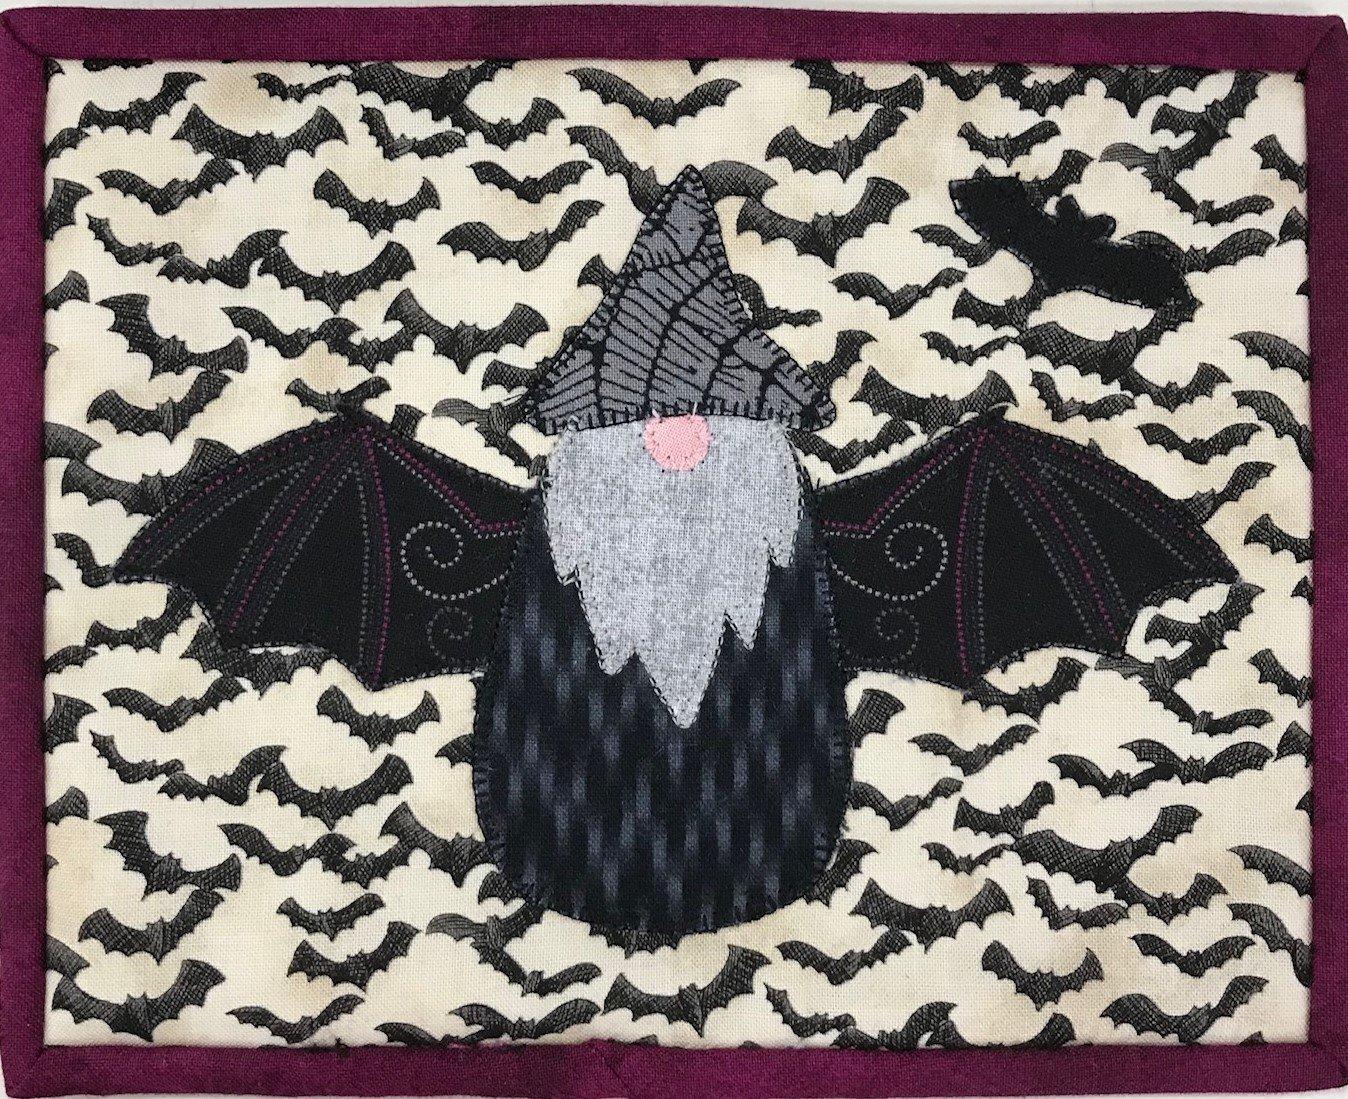 2019 Bat Gnome Kit